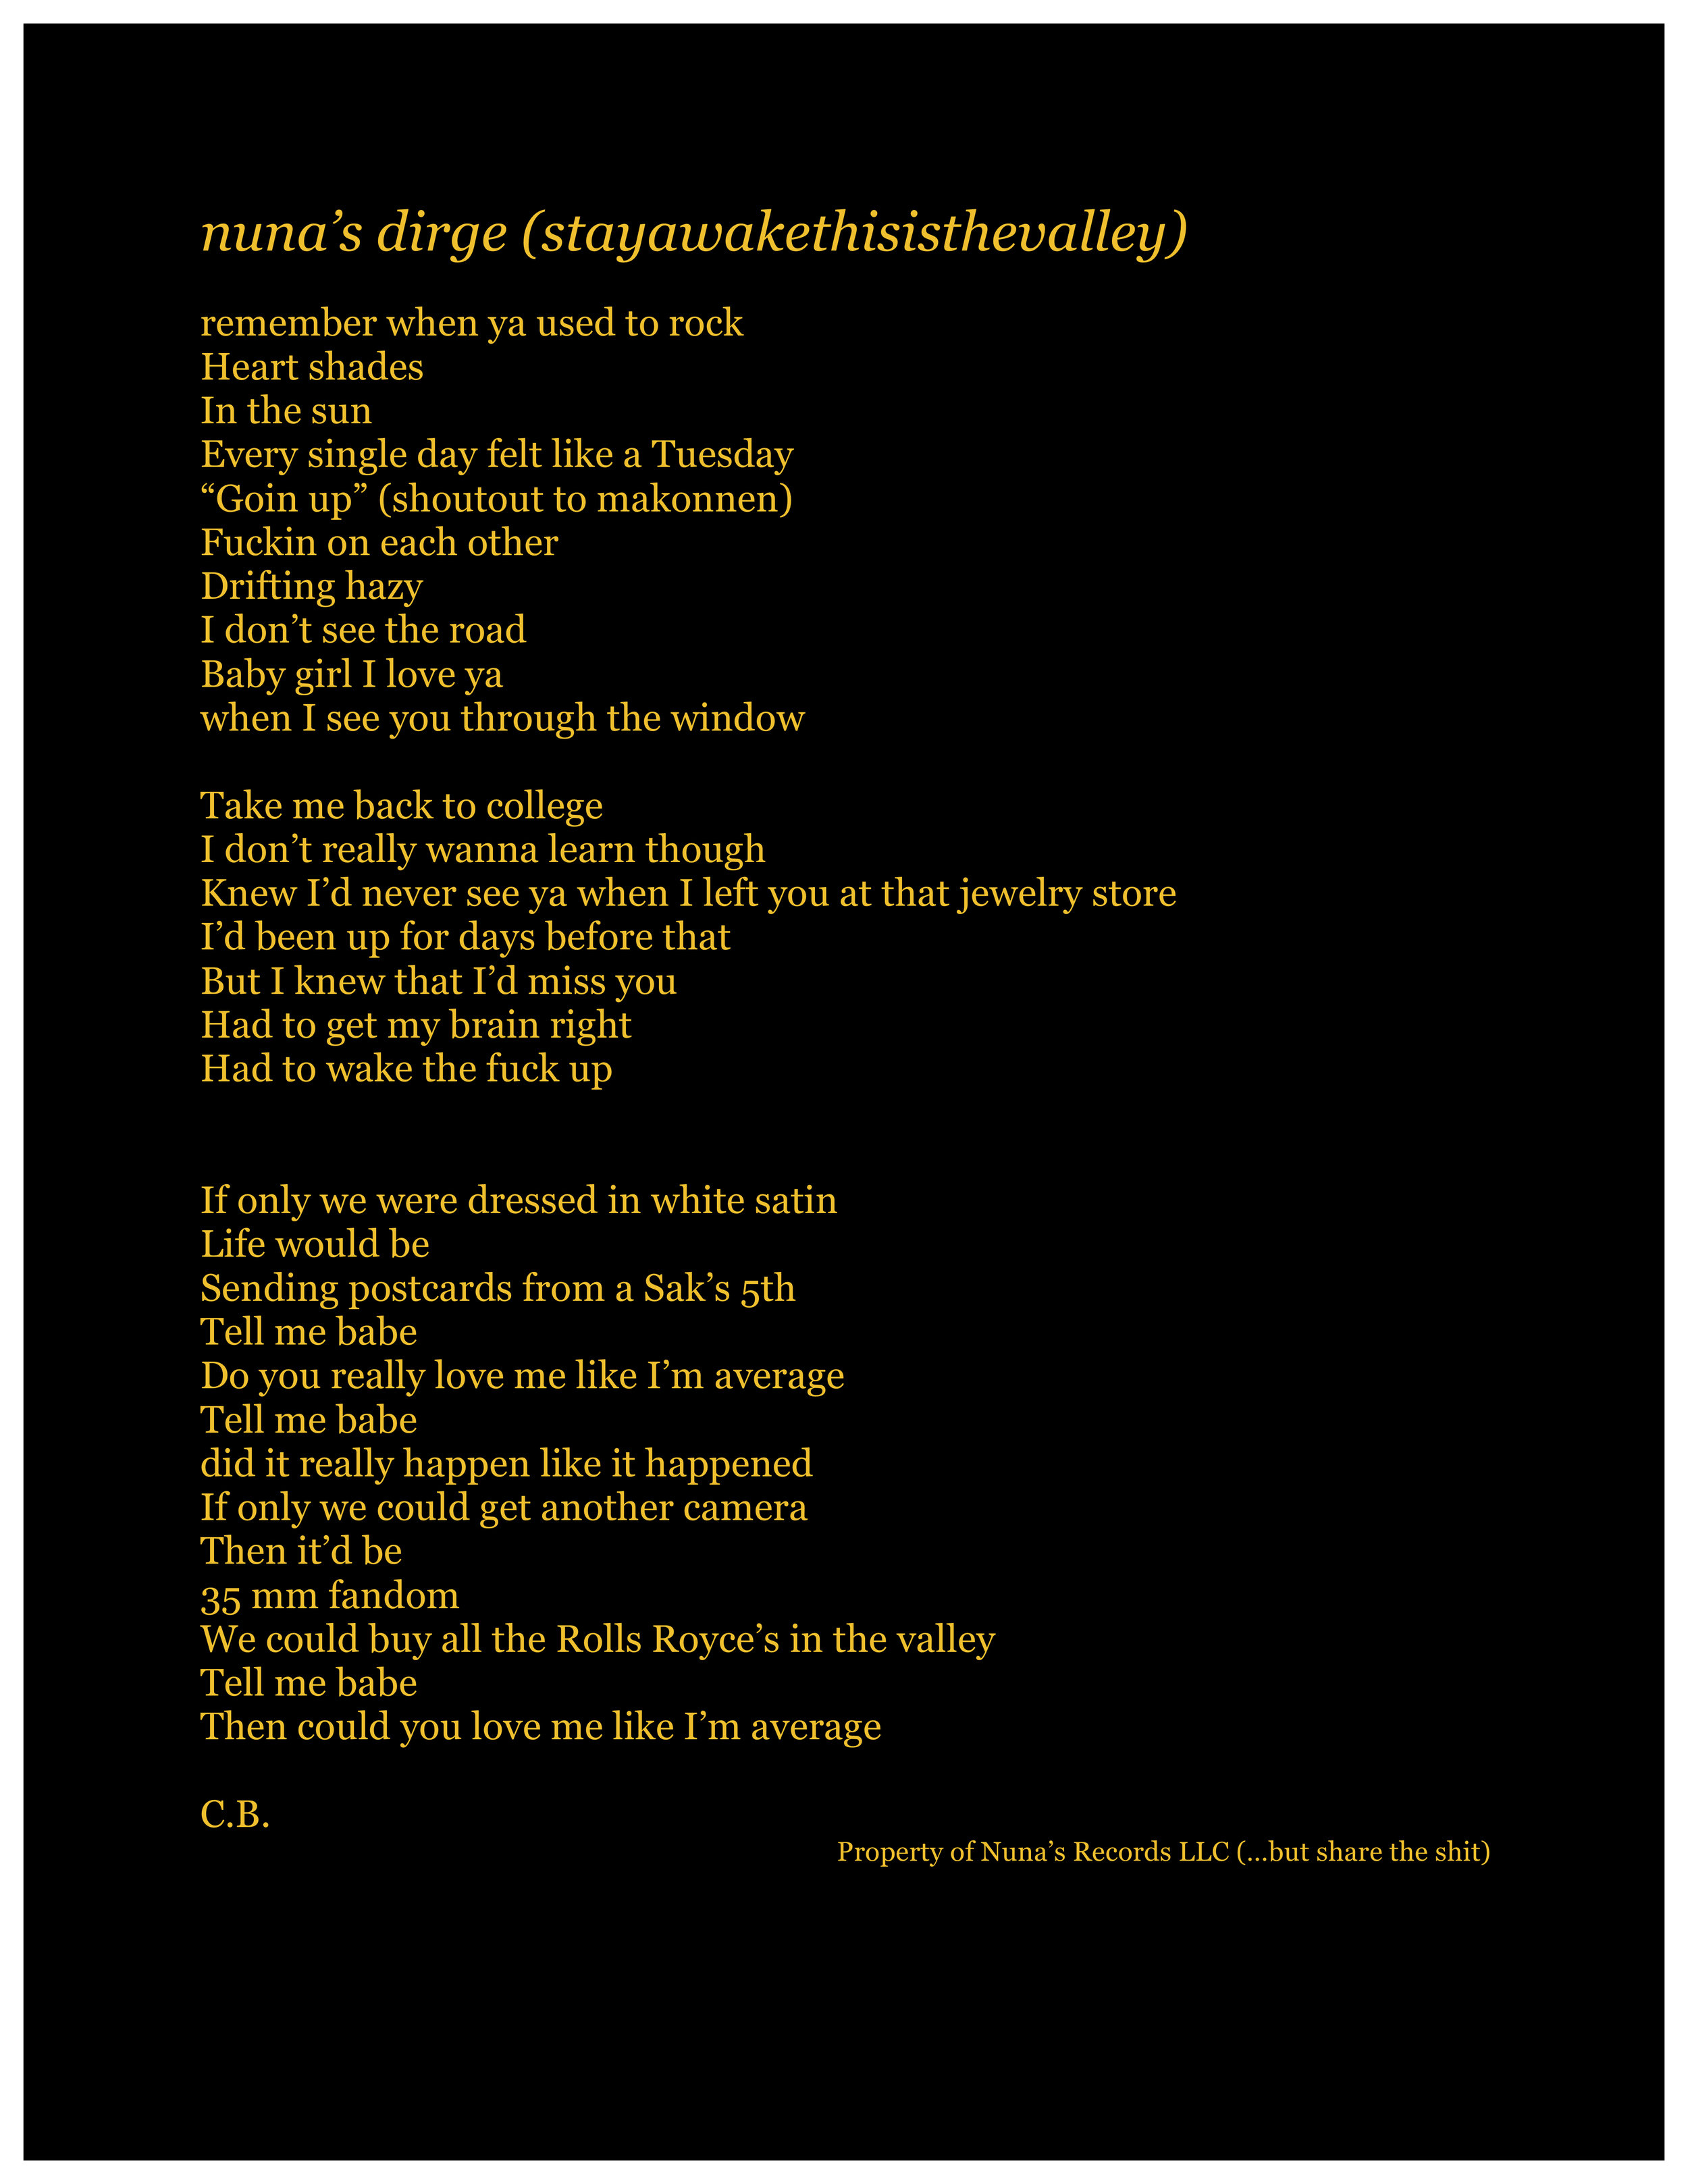 nuna's dirge (stayawakethisisthevalley) lyric sheet.jpg